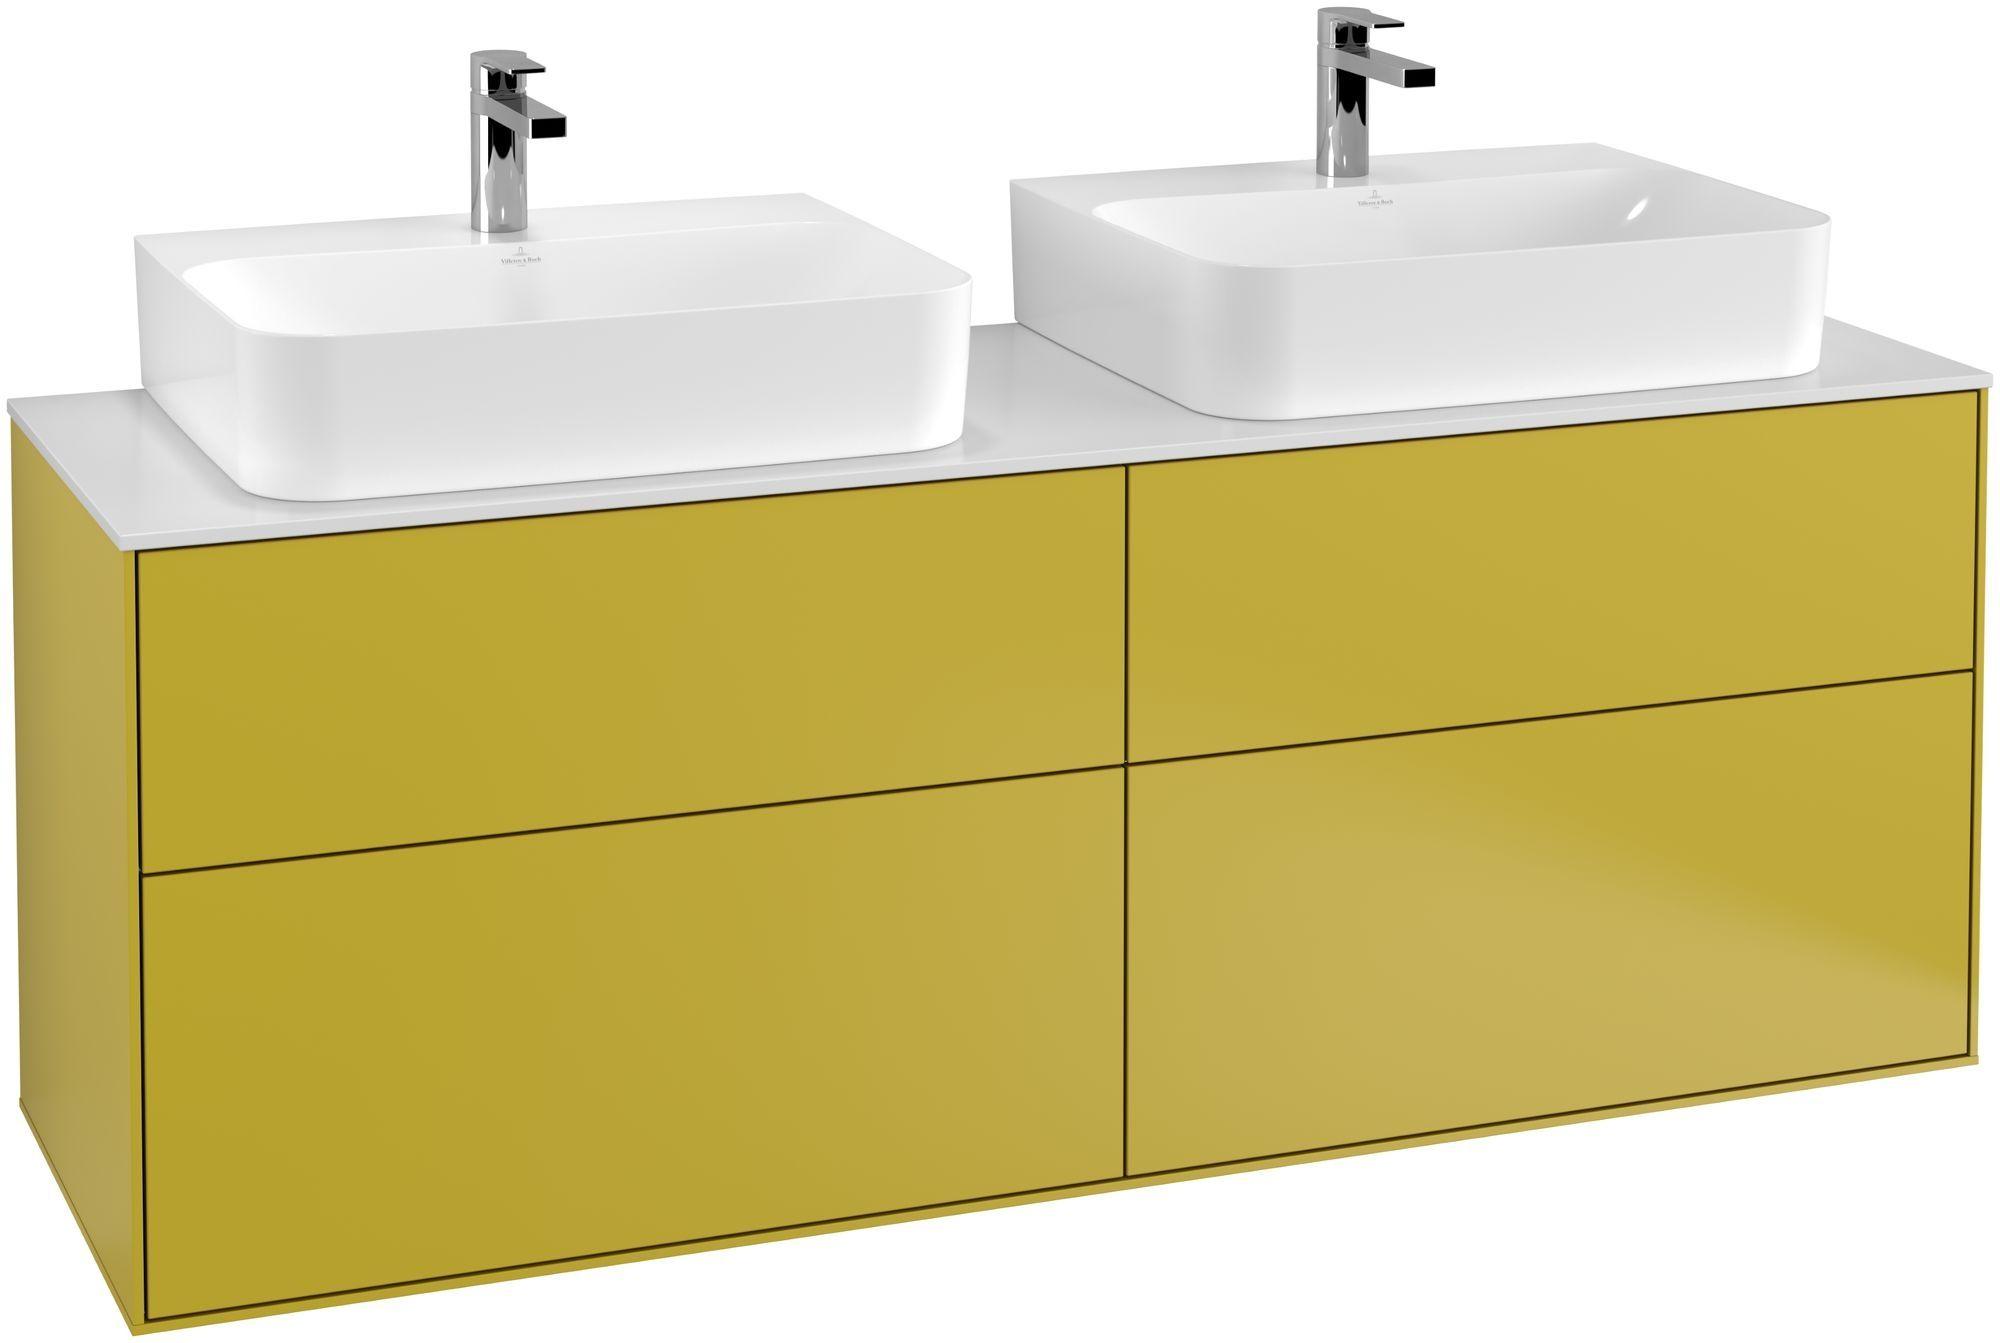 Villeroy & Boch Finion F18 Waschtischunterschrank 4 Auszüge B:160xH:60,3xT:50,1cm Front, Korpus: Sun, Glasplatte: White Matt F18100HE